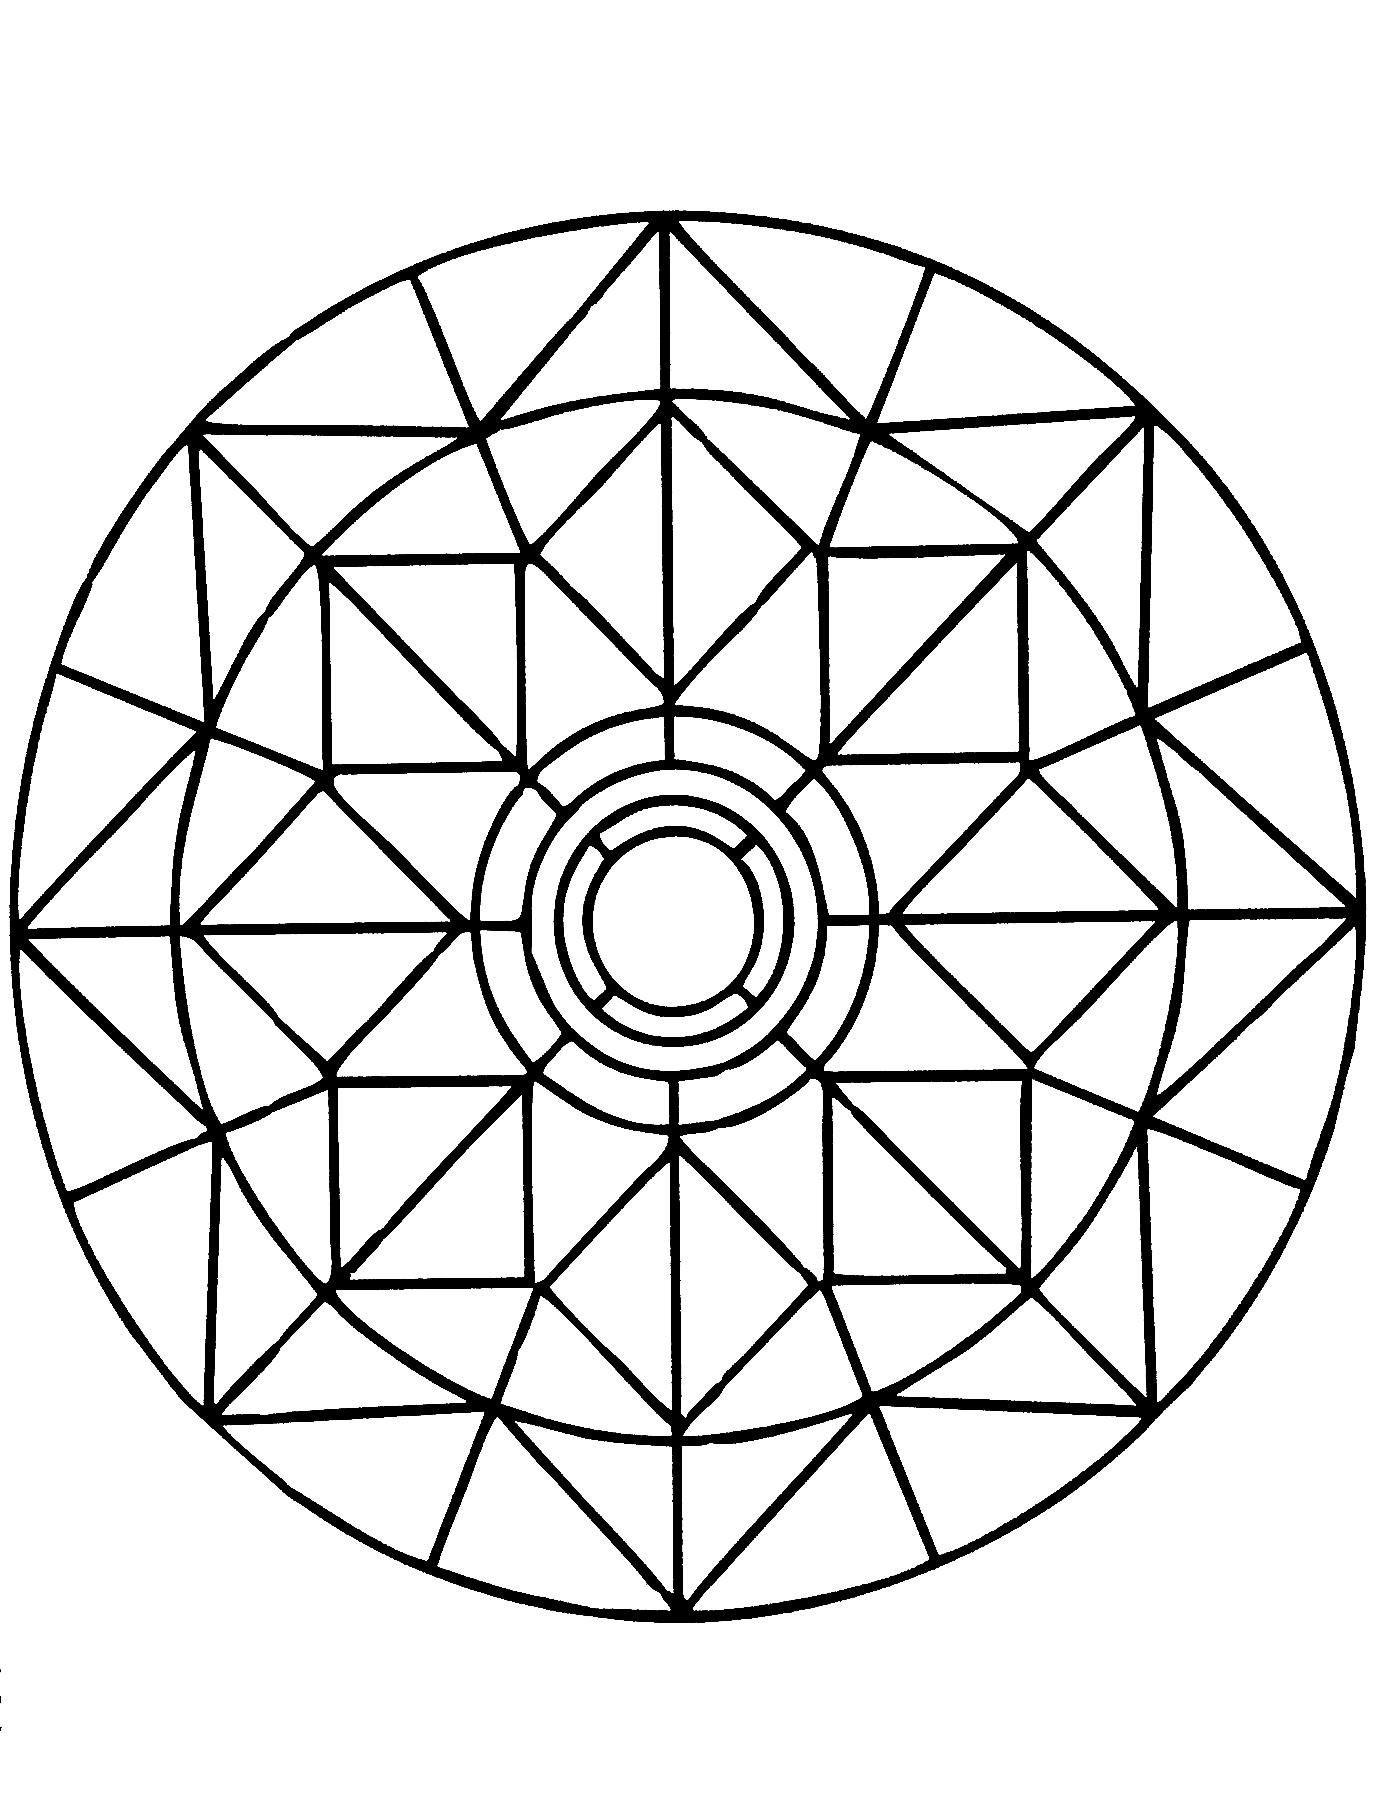 Mandalas to print free 22 Simple